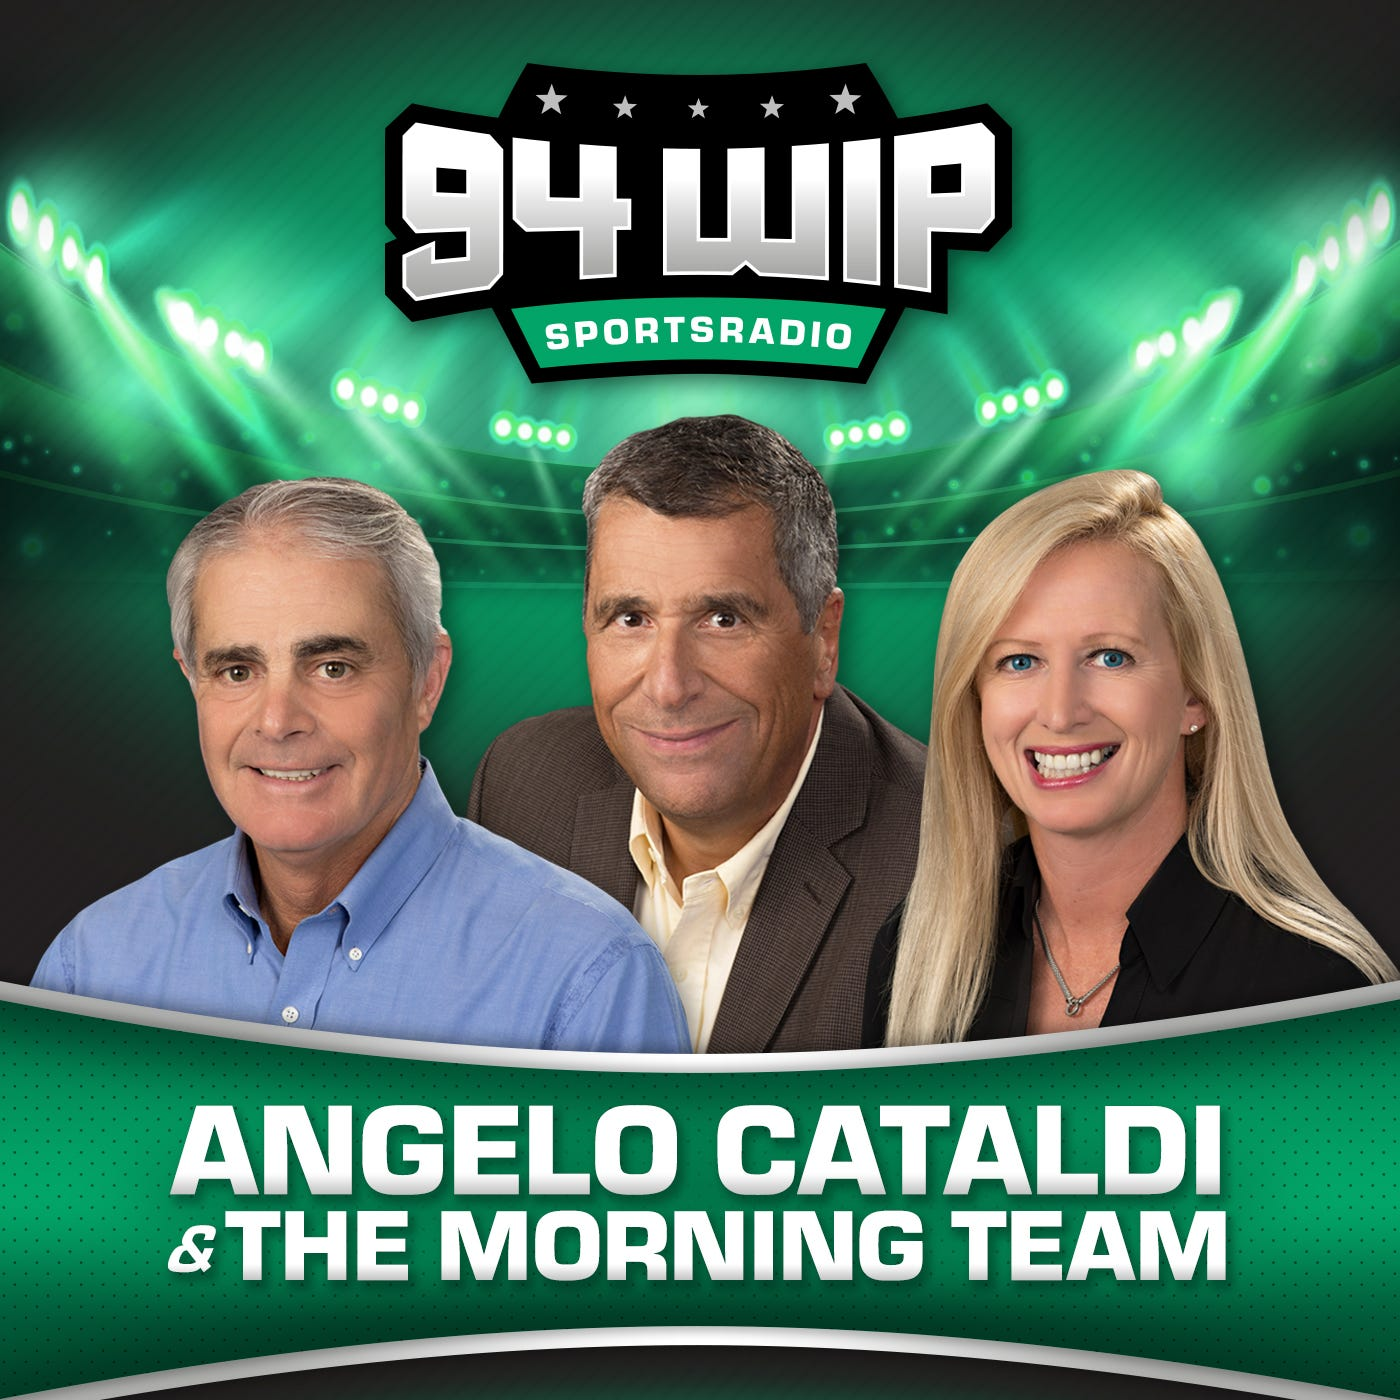 SportsRadio 94WIP on Radio com: Listen to Free Radio Online | Music